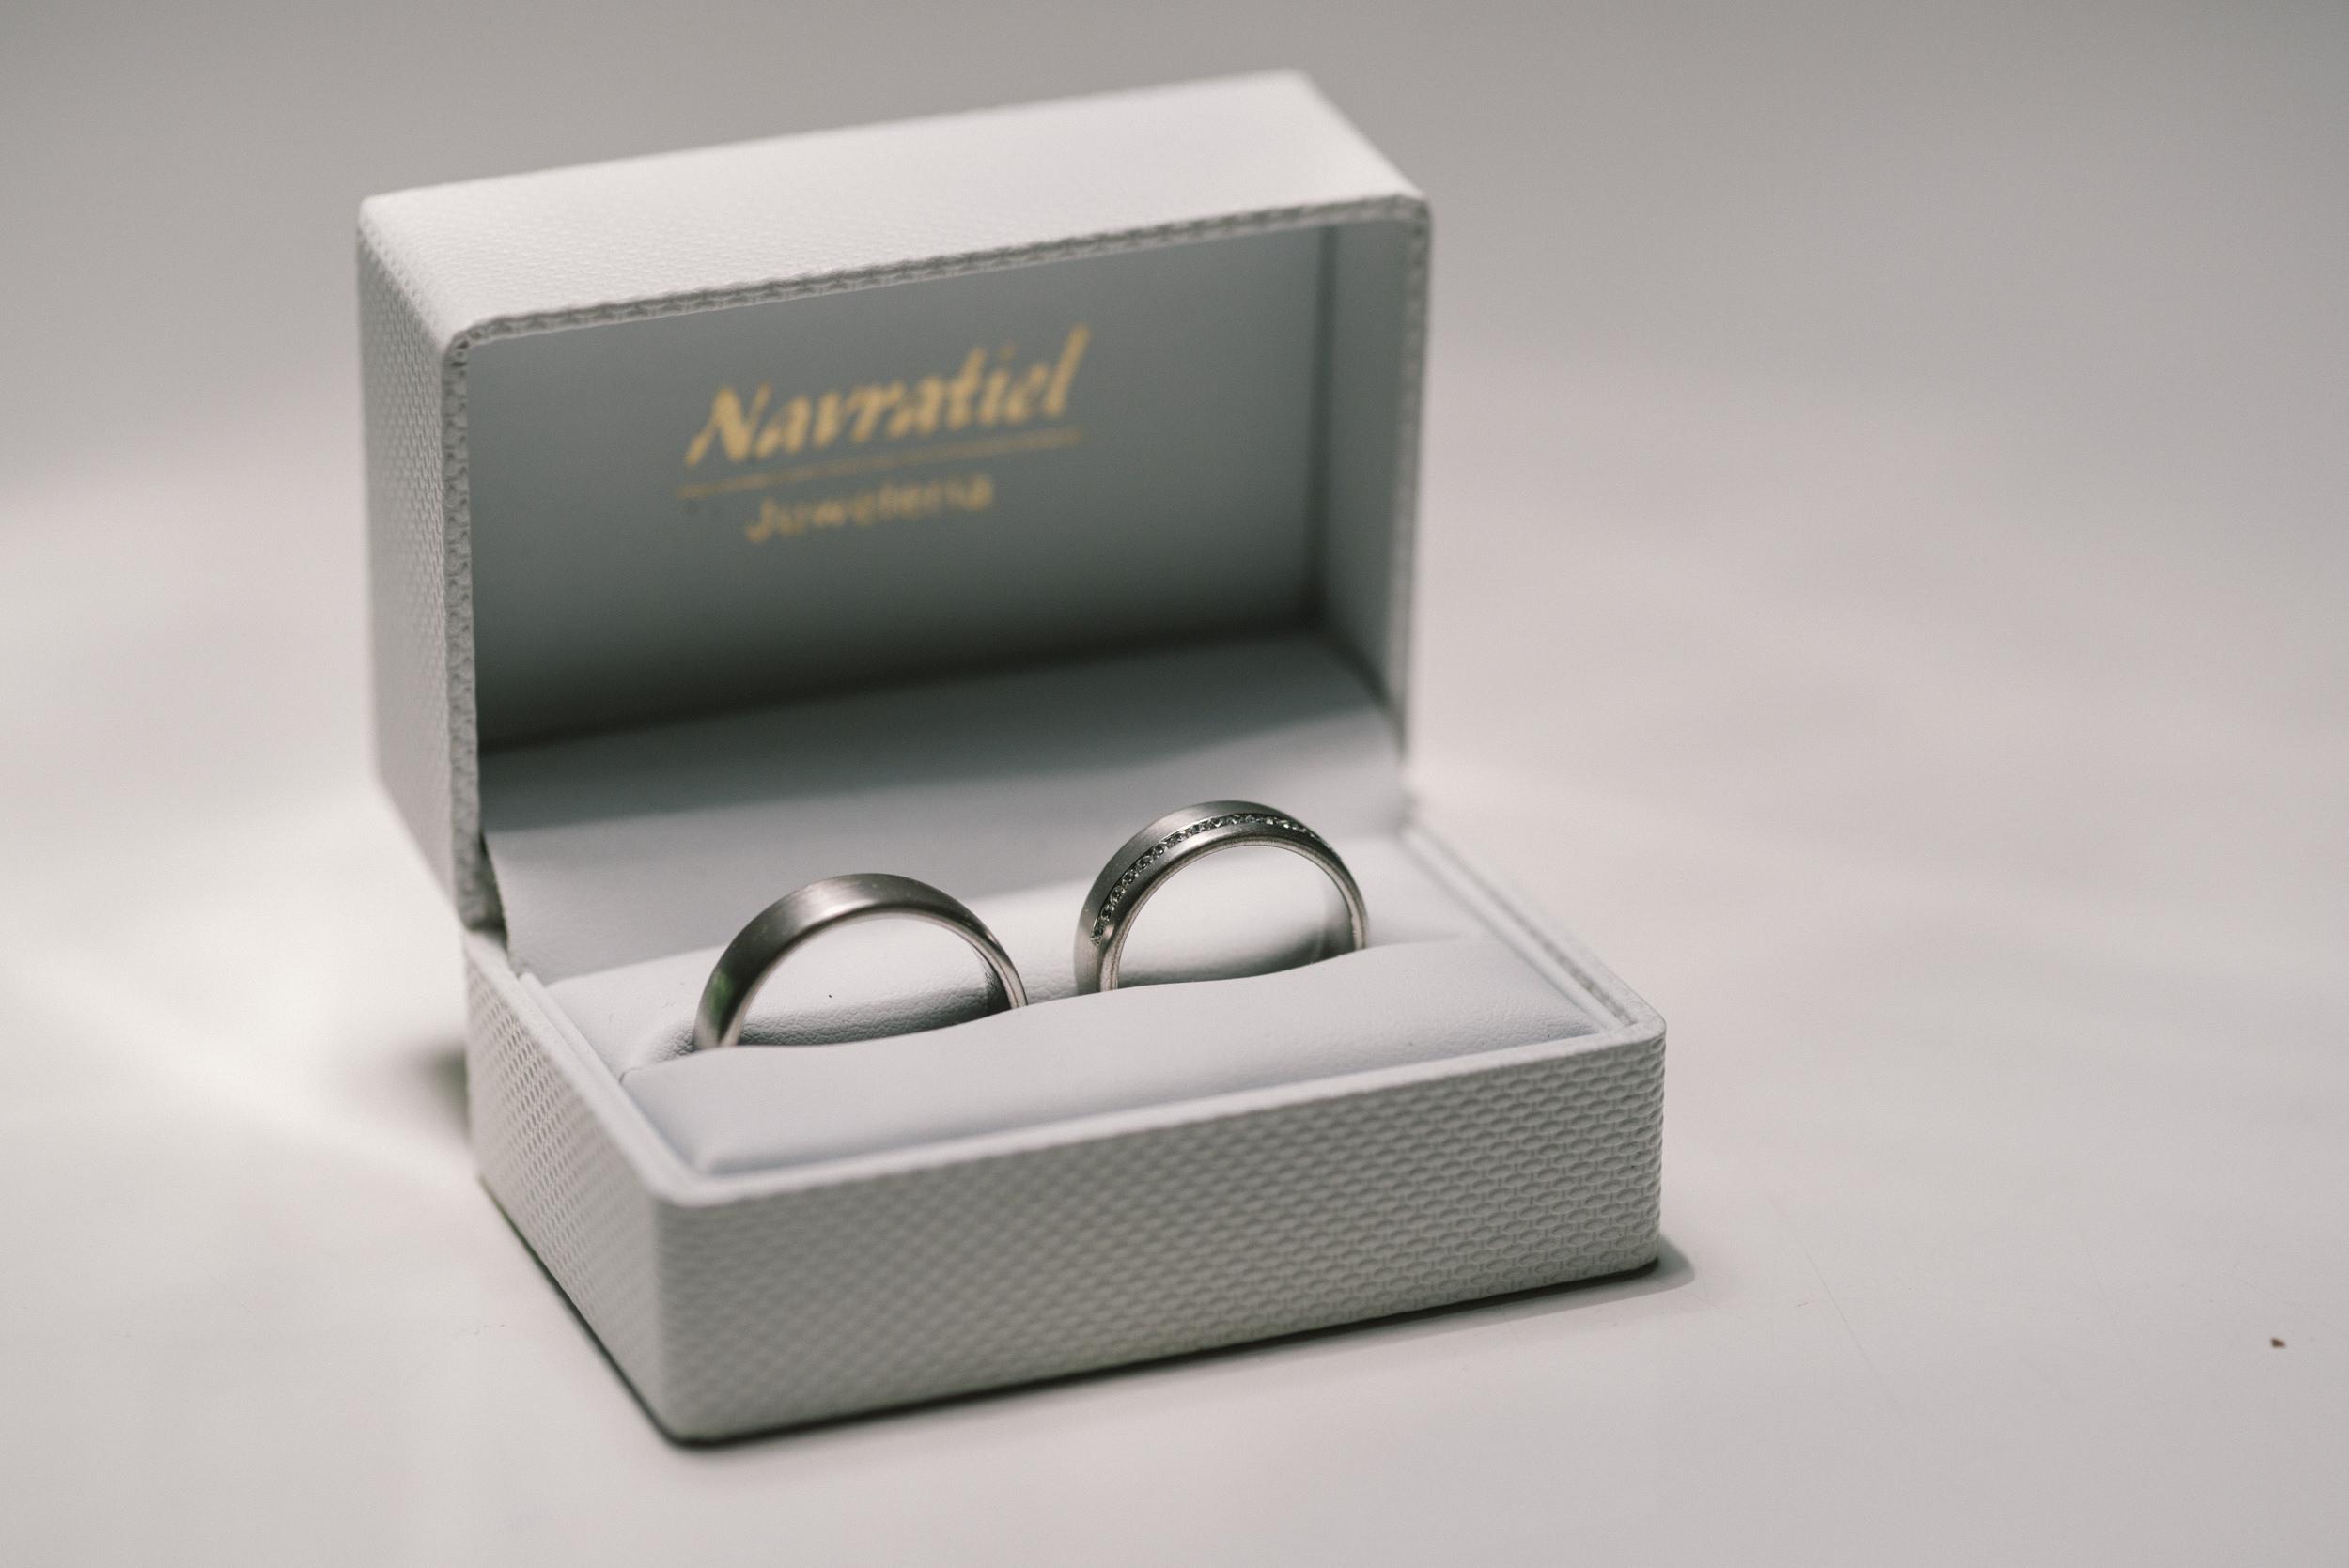 Juweleria_Navratiel_2018_WEB-032